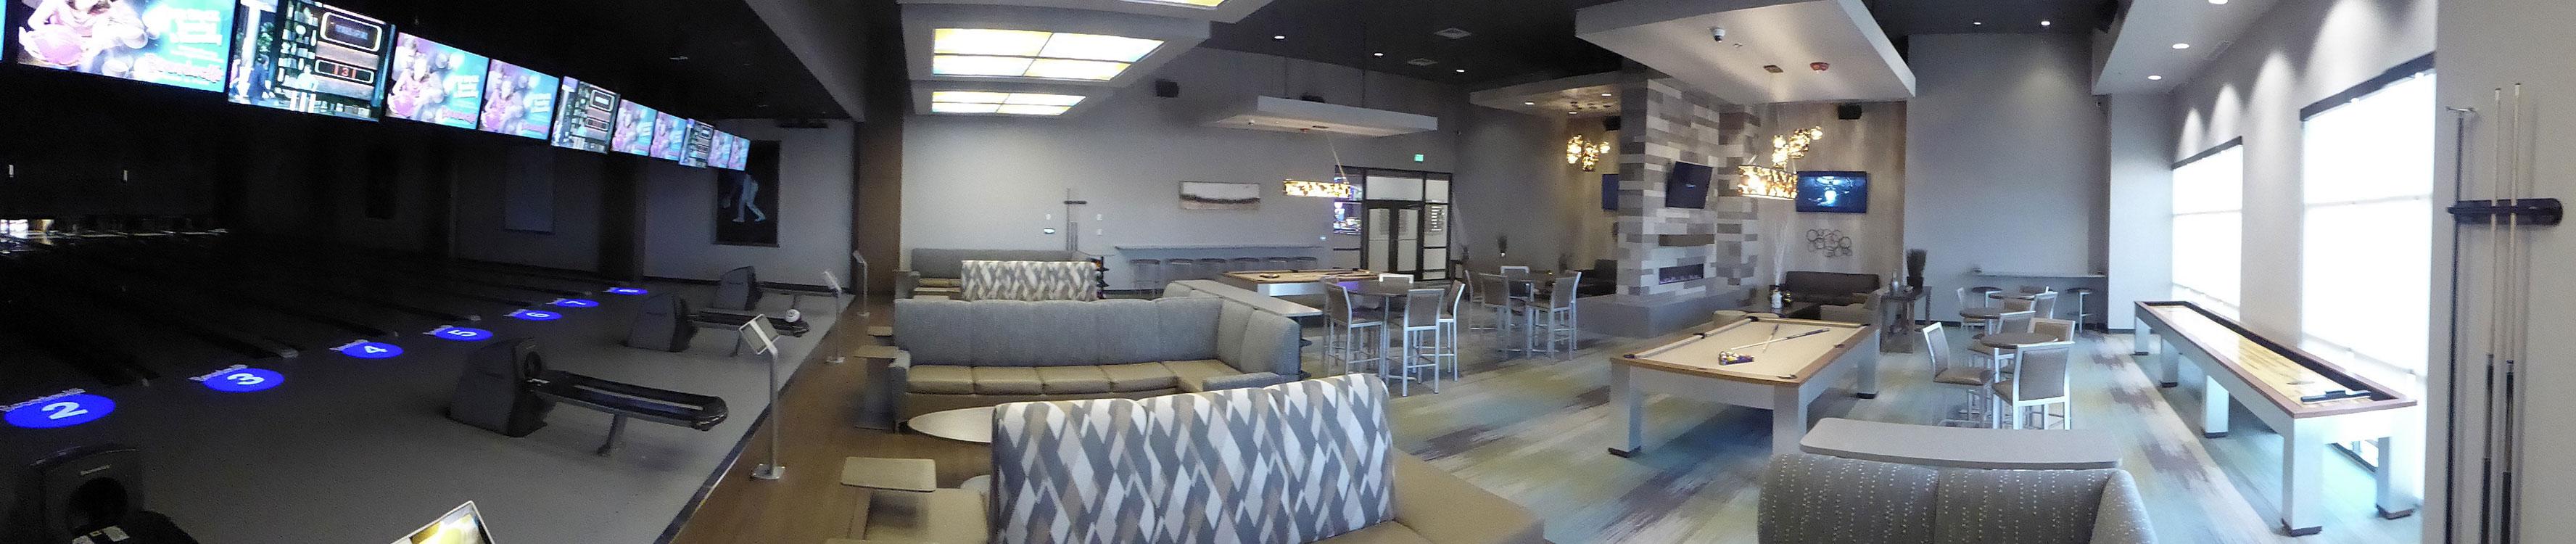 Boondocks Parker - VIP Lounge Panorama